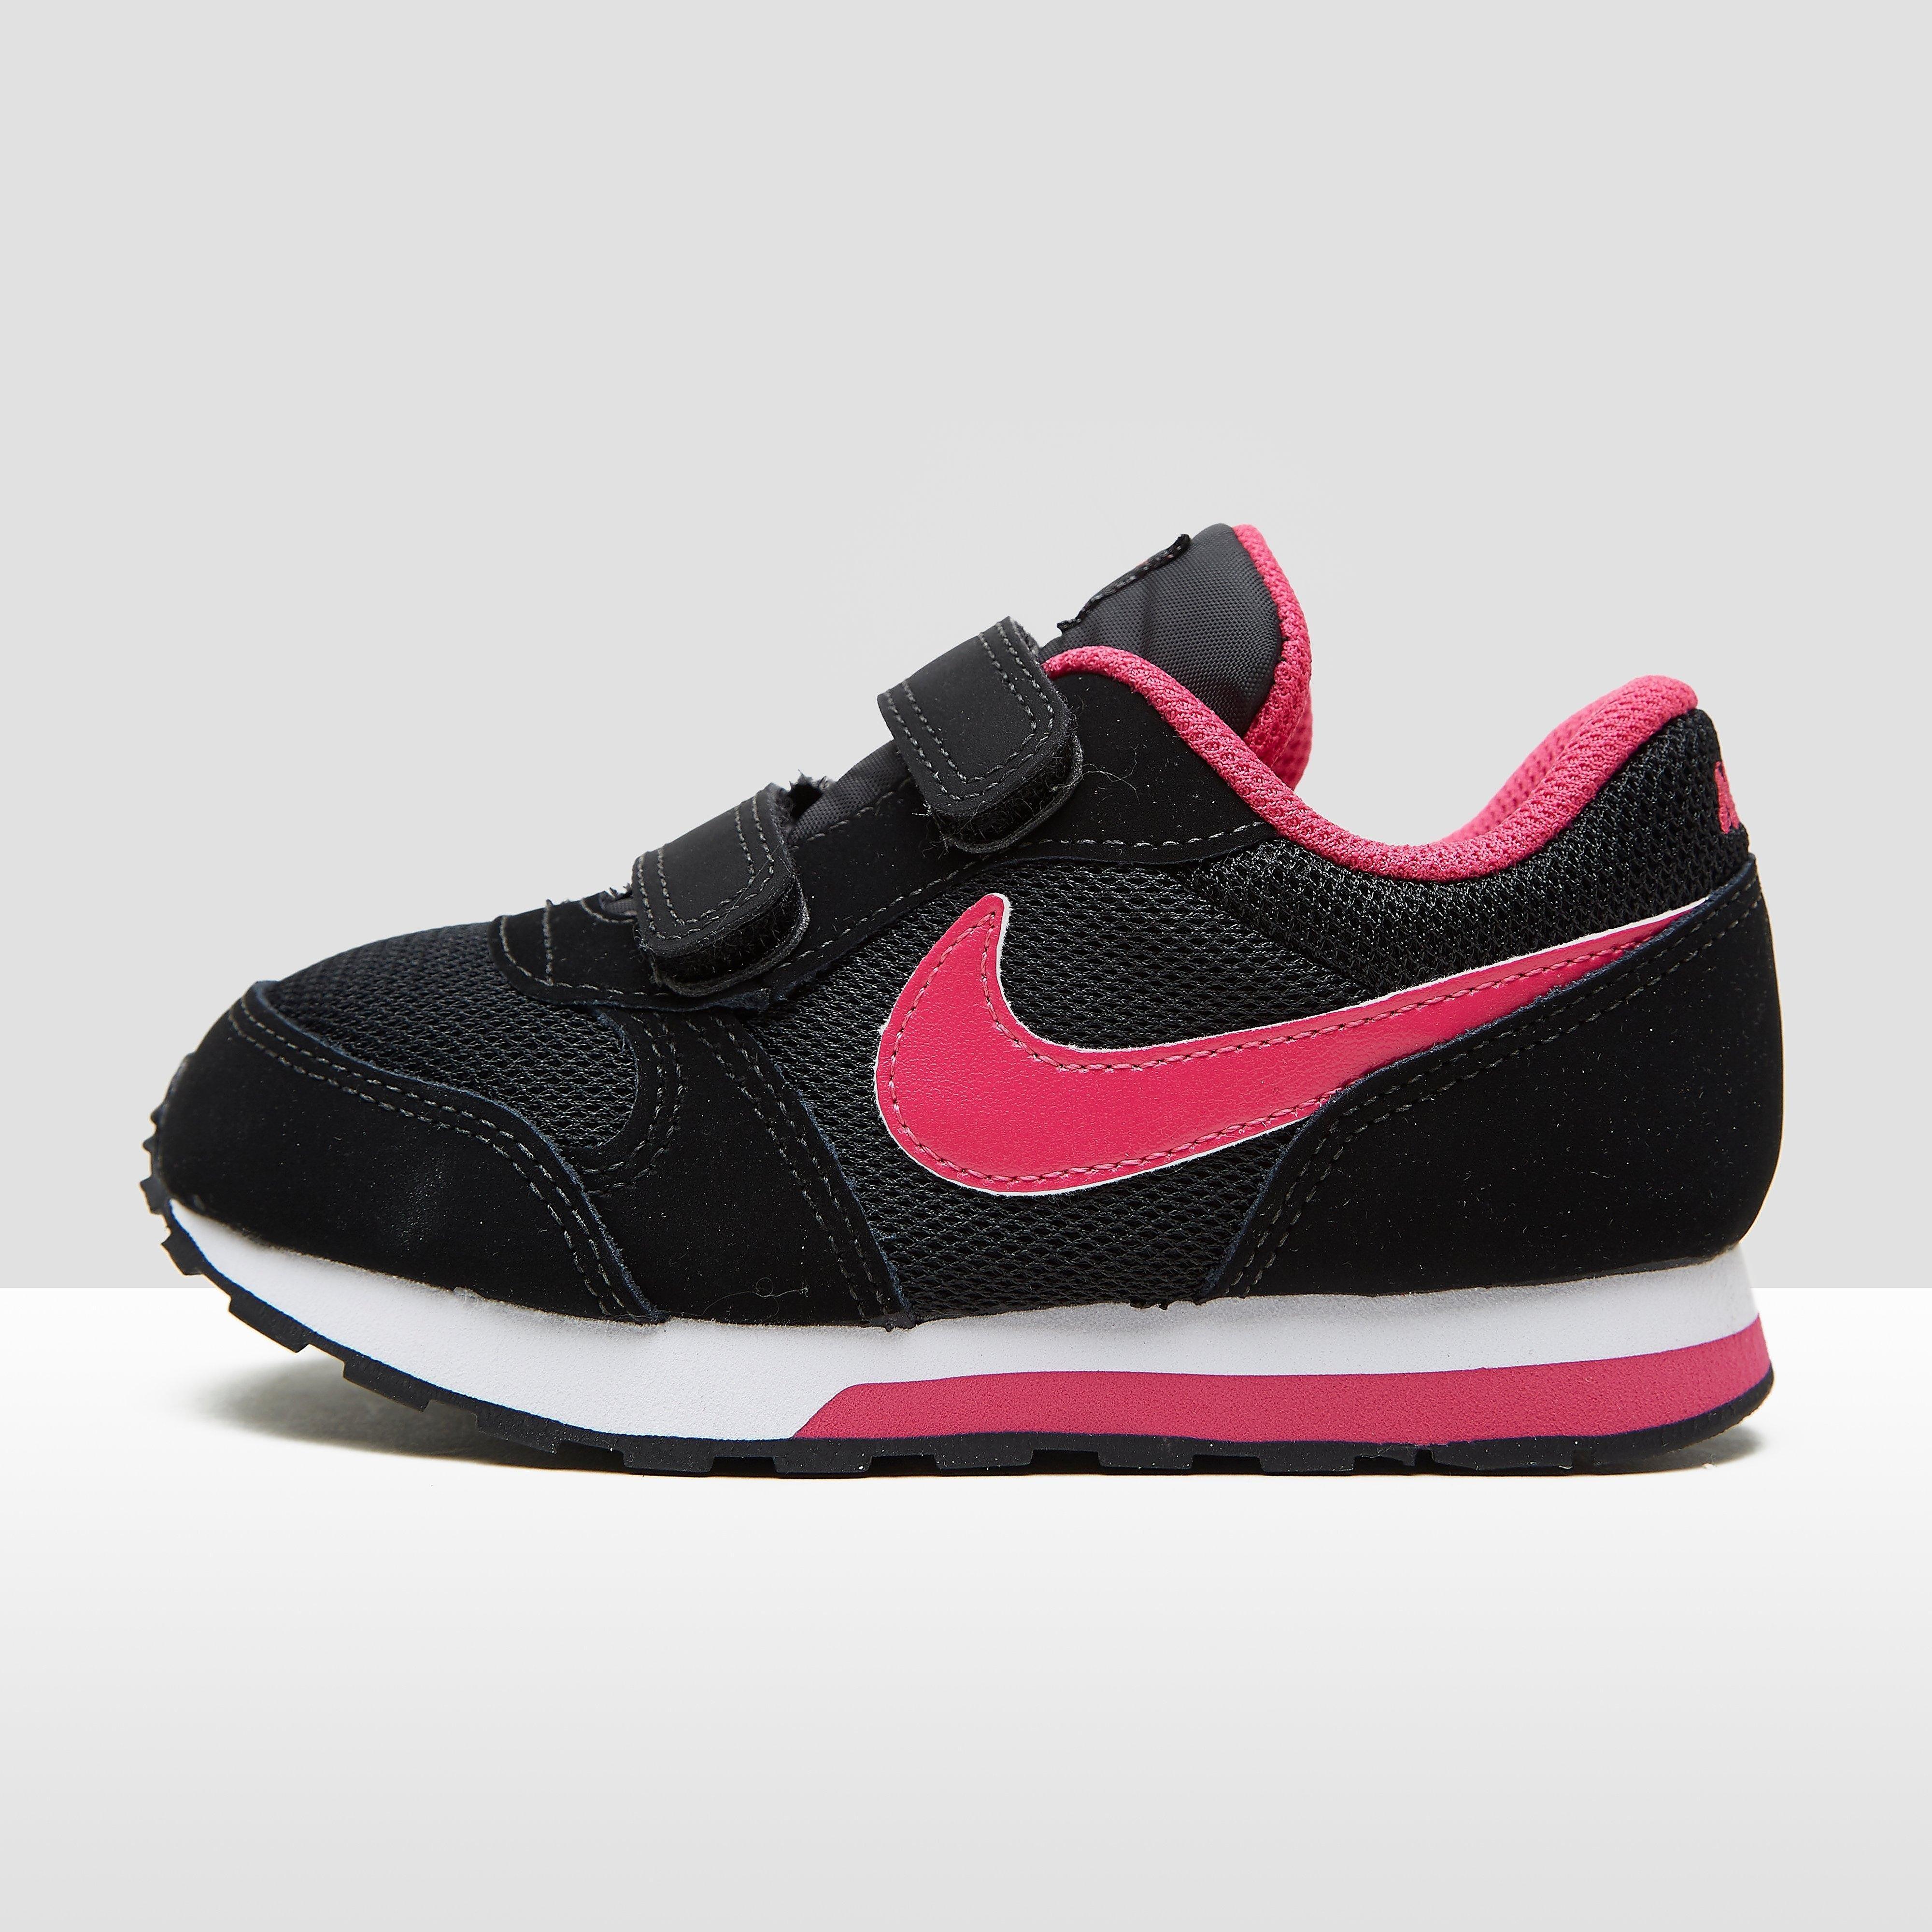 Nike MD Runner babysneaker zwart en roze